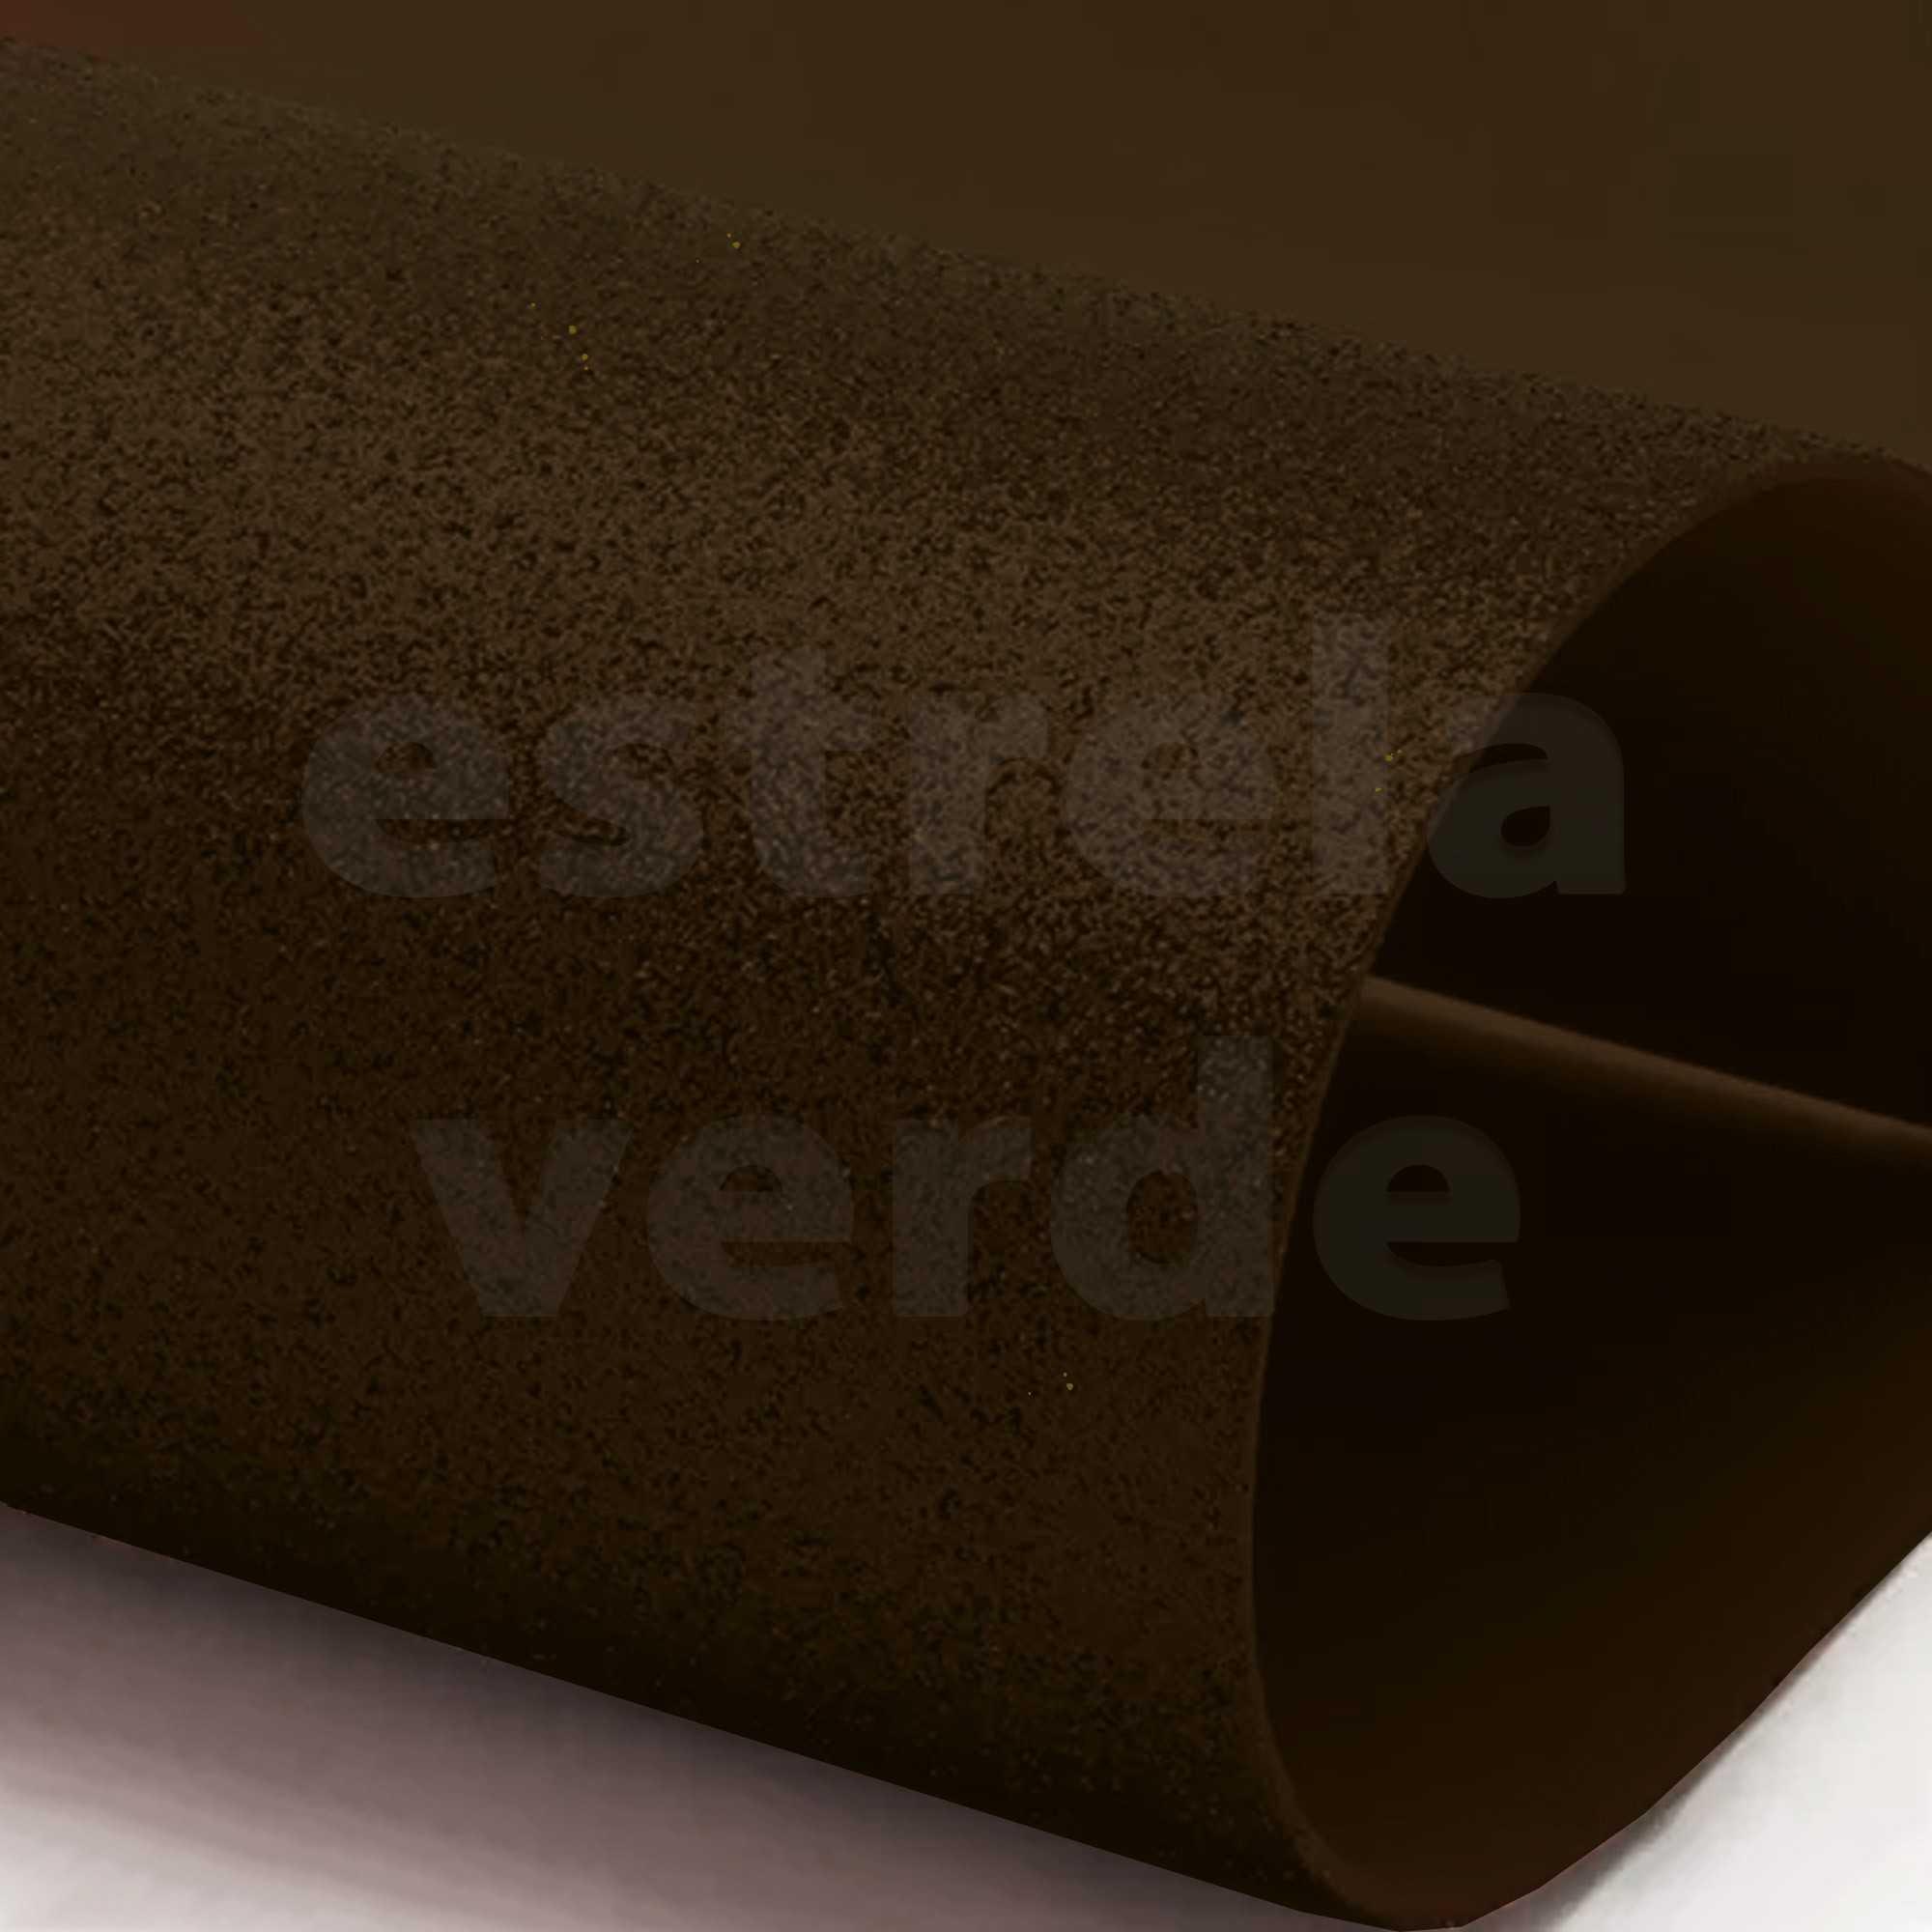 EVA GLITTER 40X60 MARROM 2MM  - Estrela Verde